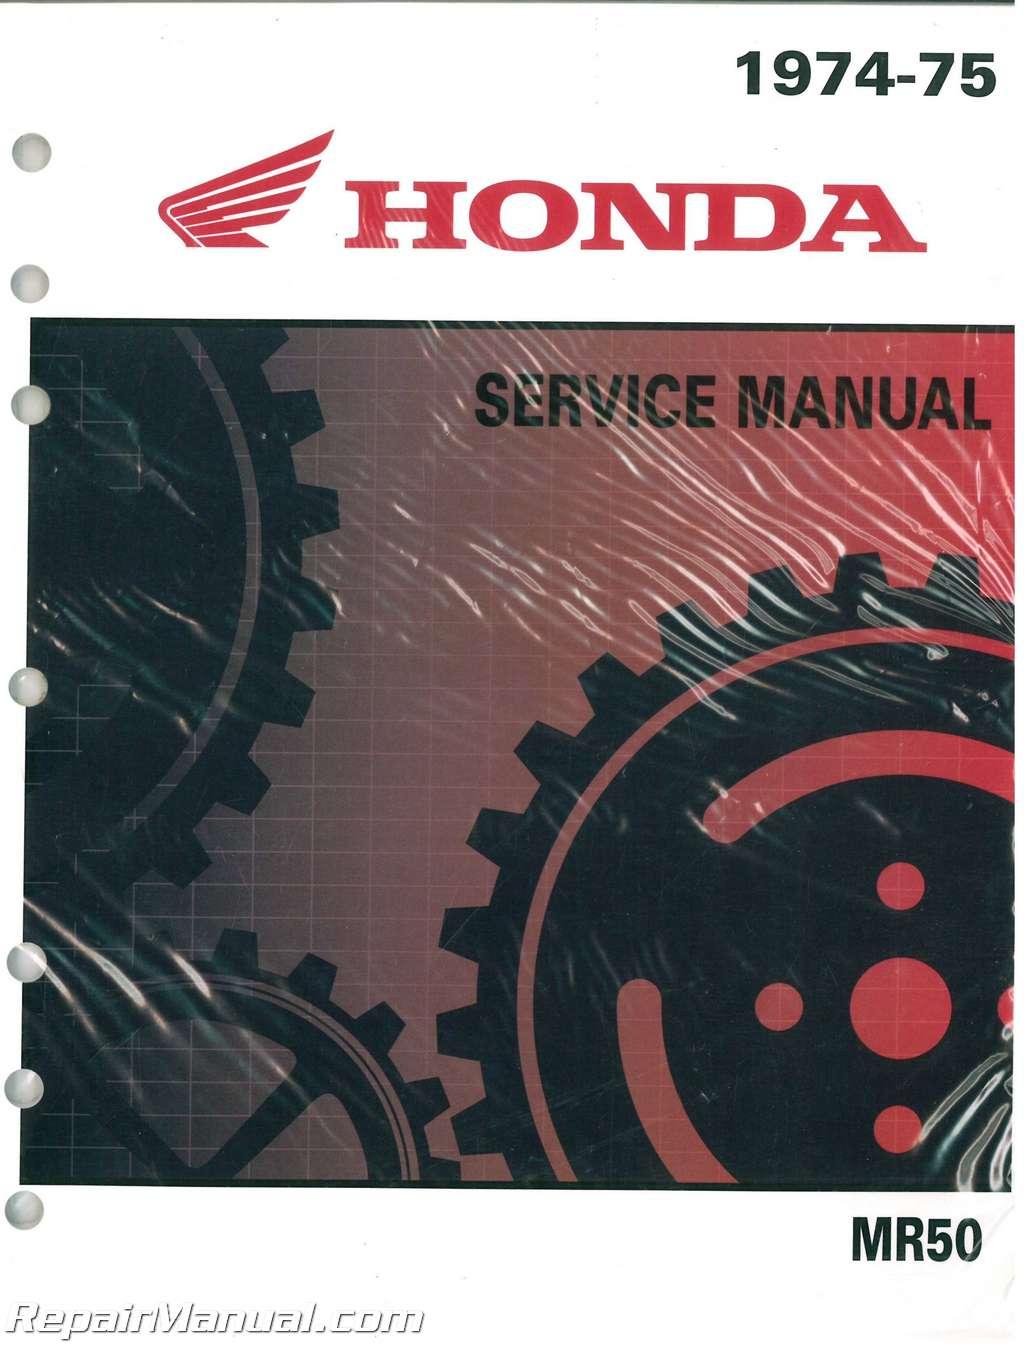 Wiring Diagram Honda Mr50 Z50 Motorcycle Service Manual And Parts 1974 1975 Rh Repairmanual Com Mb50